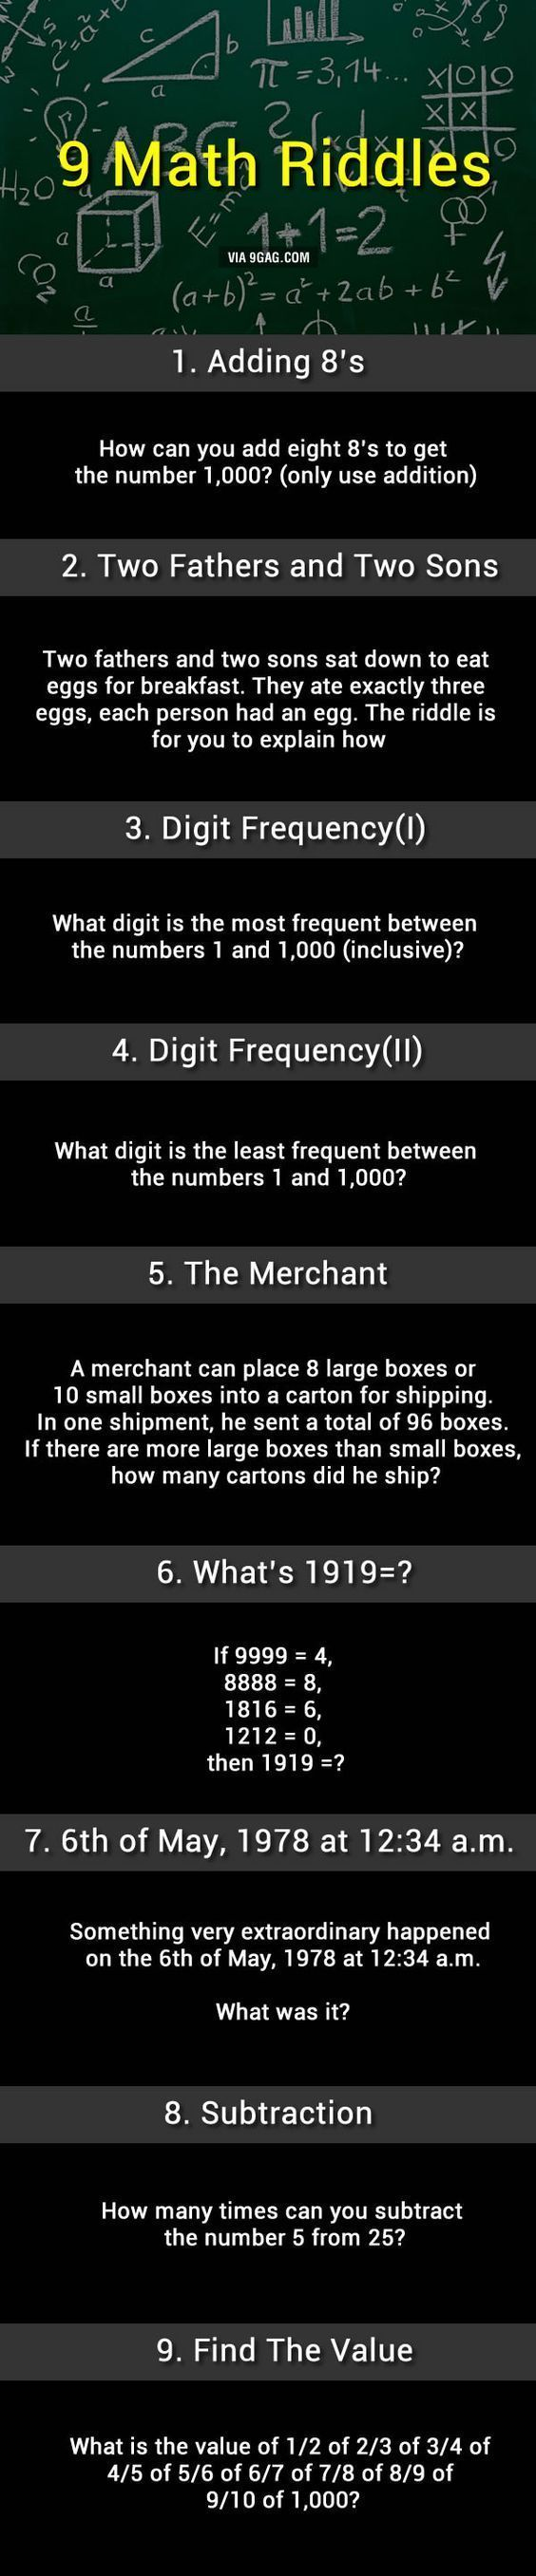 9 Math Riddles, Can You Solve Them? #mathtricks #mathhacks